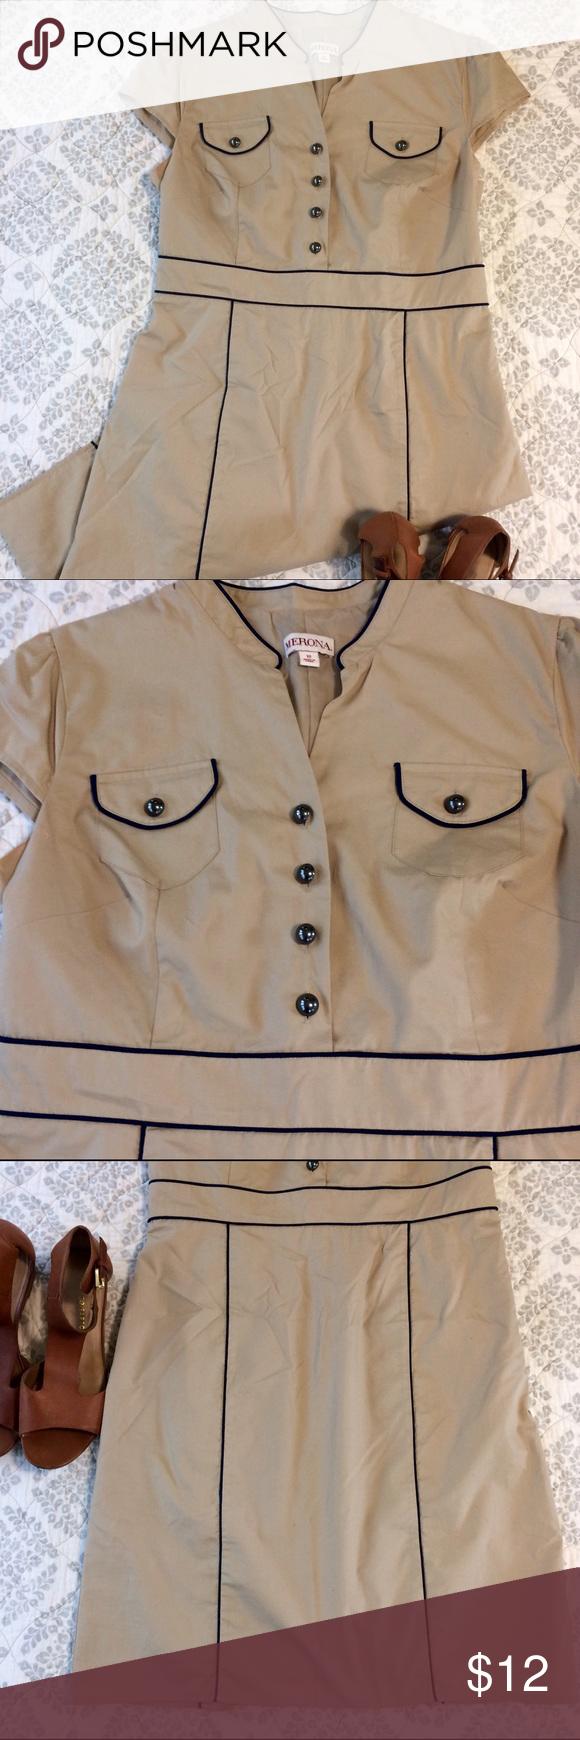 👗Merona Size 12 Short Sleeve Dress EUC